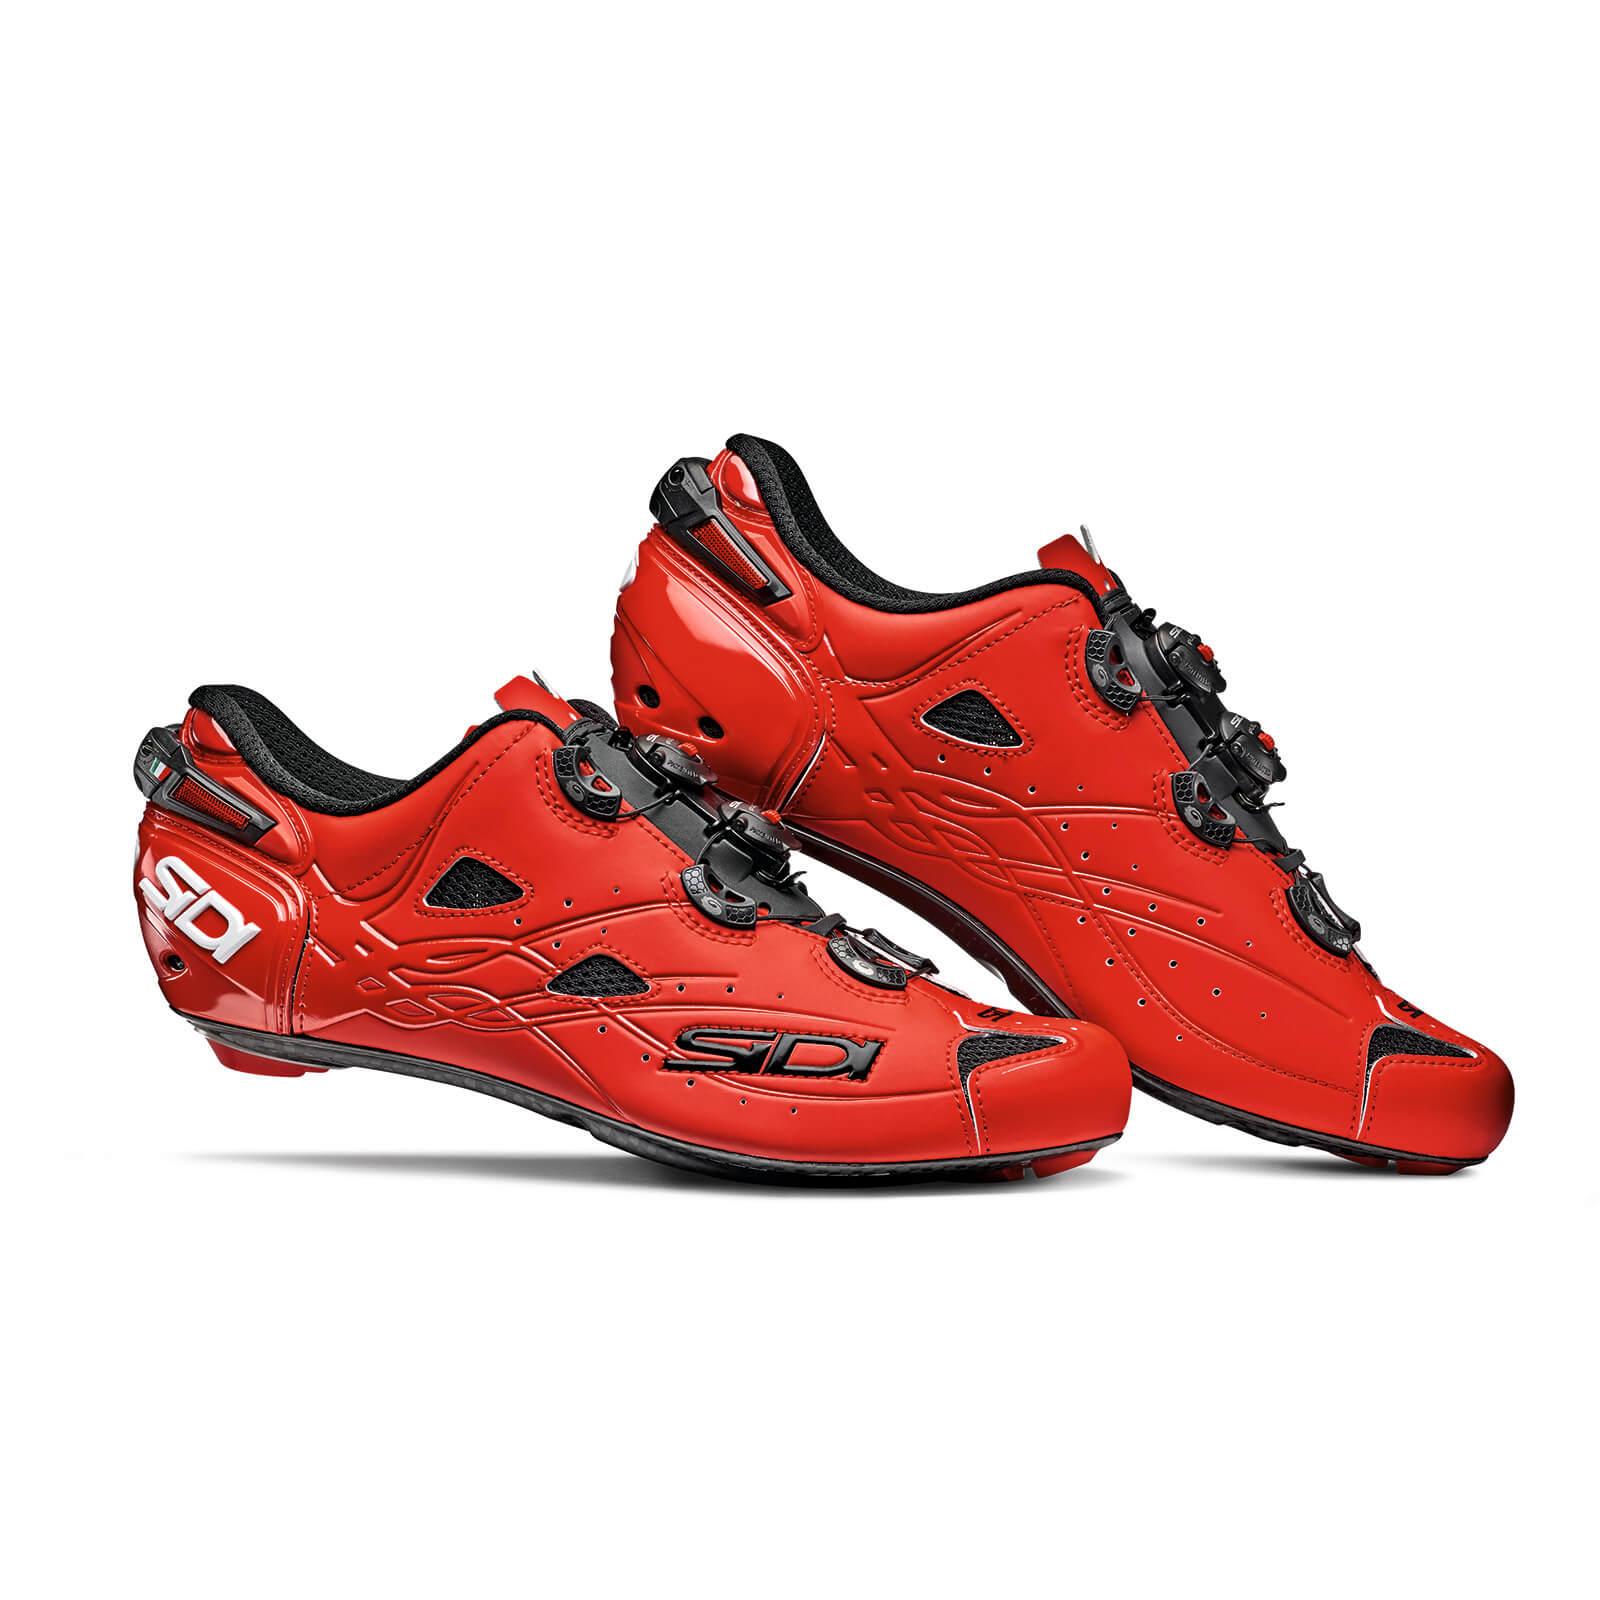 Sidi Shot Matt Road Shoes - Matt Red - EU 45 - Matt Red